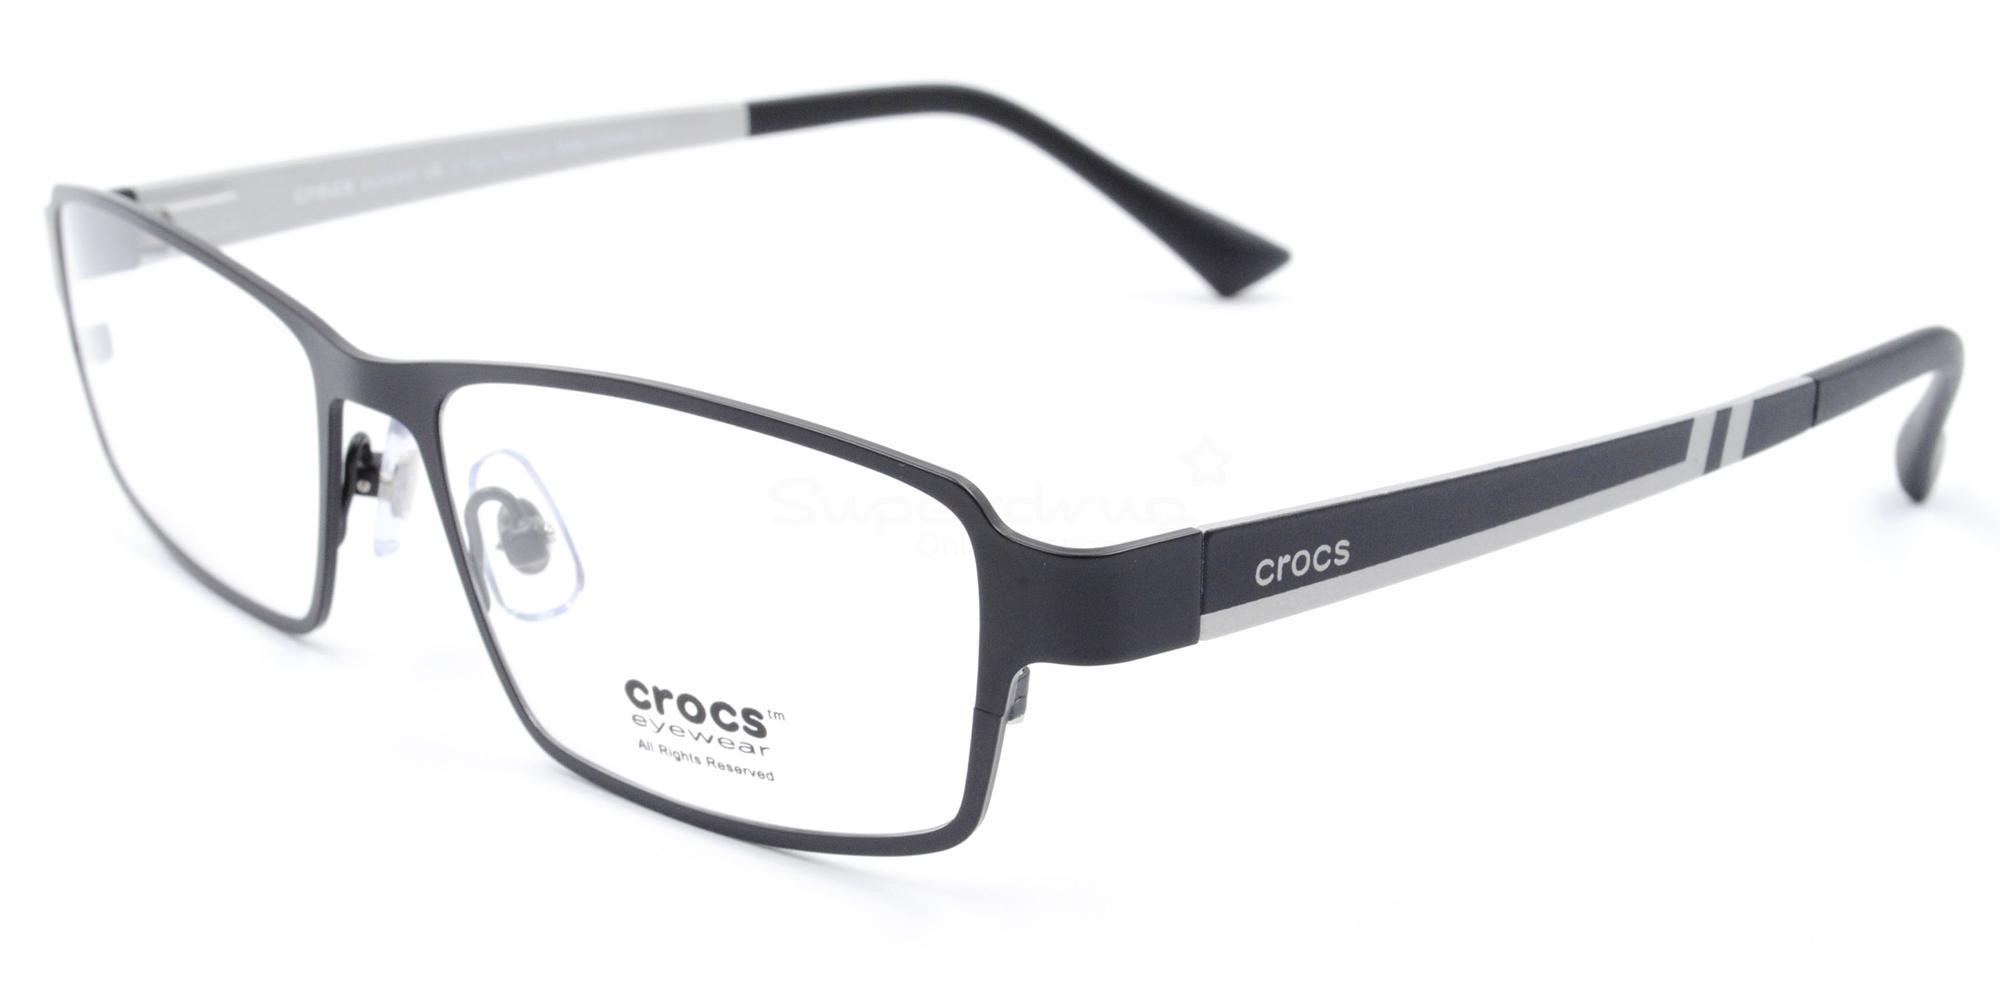 20SR CF626 , Crocs Eyewear